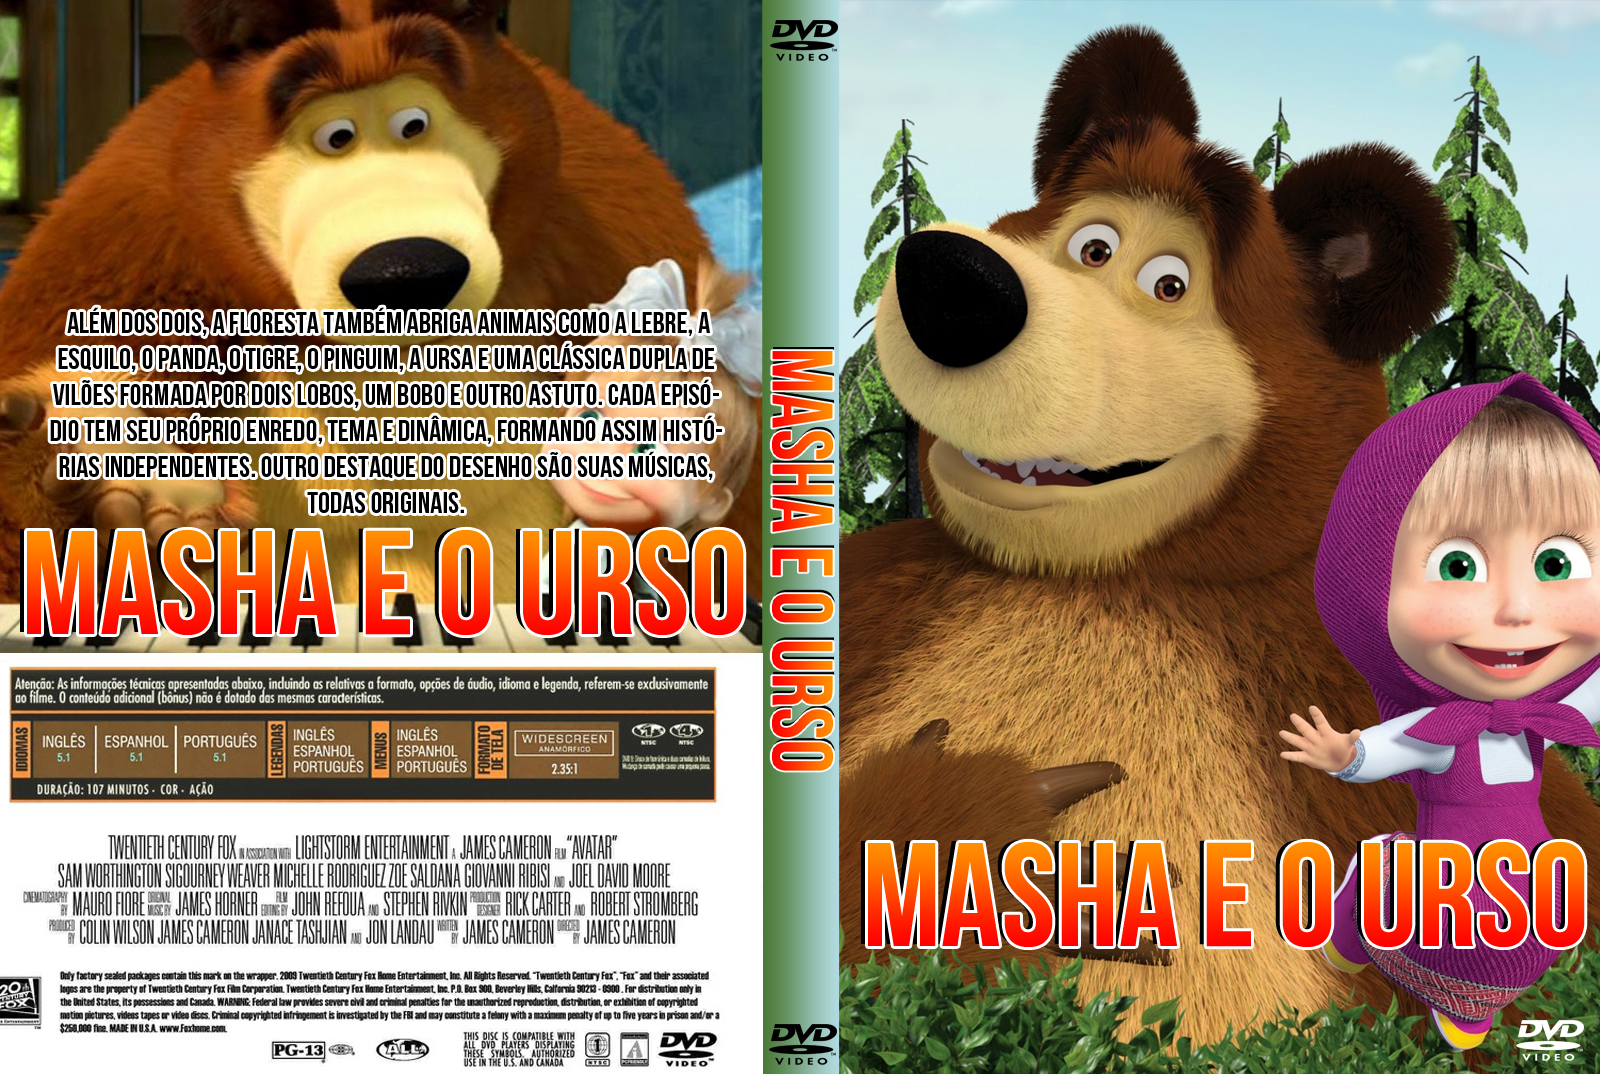 Masha e o Urso O Filme Masha e o Urso O Filme Masha 2Be 2Bo 2BUrso